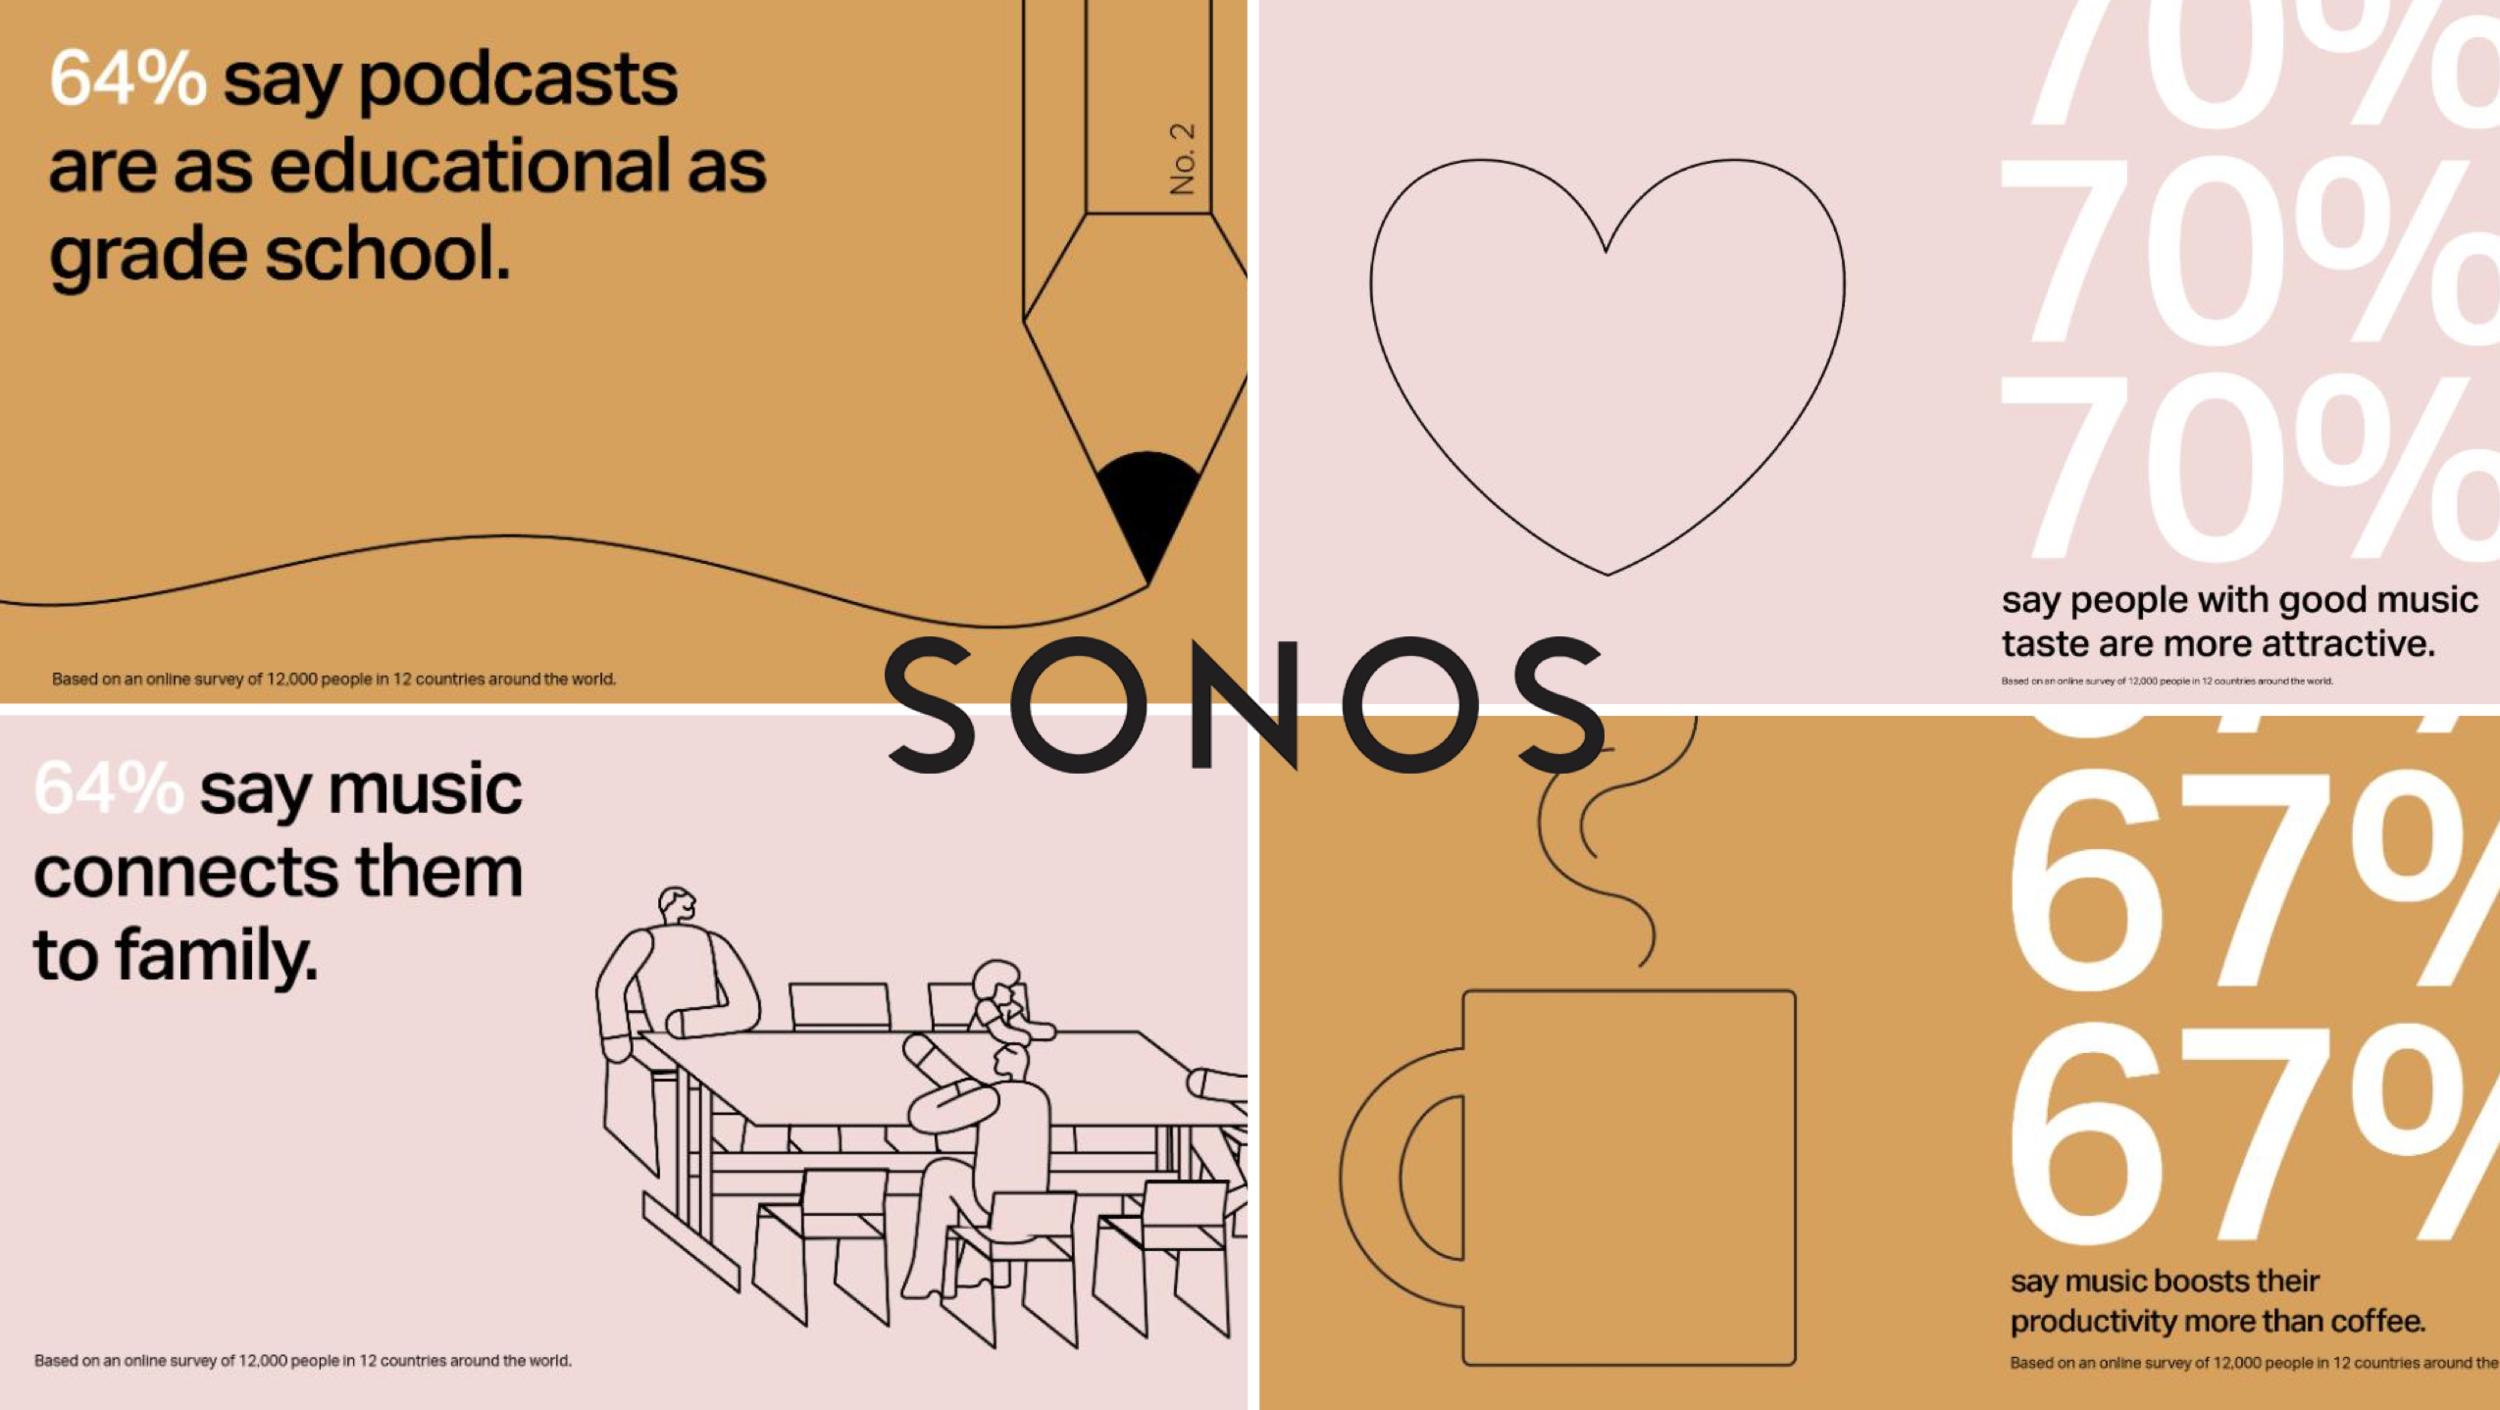 Sonos%20Brilliant%20Sound%20jpeg%20white.png